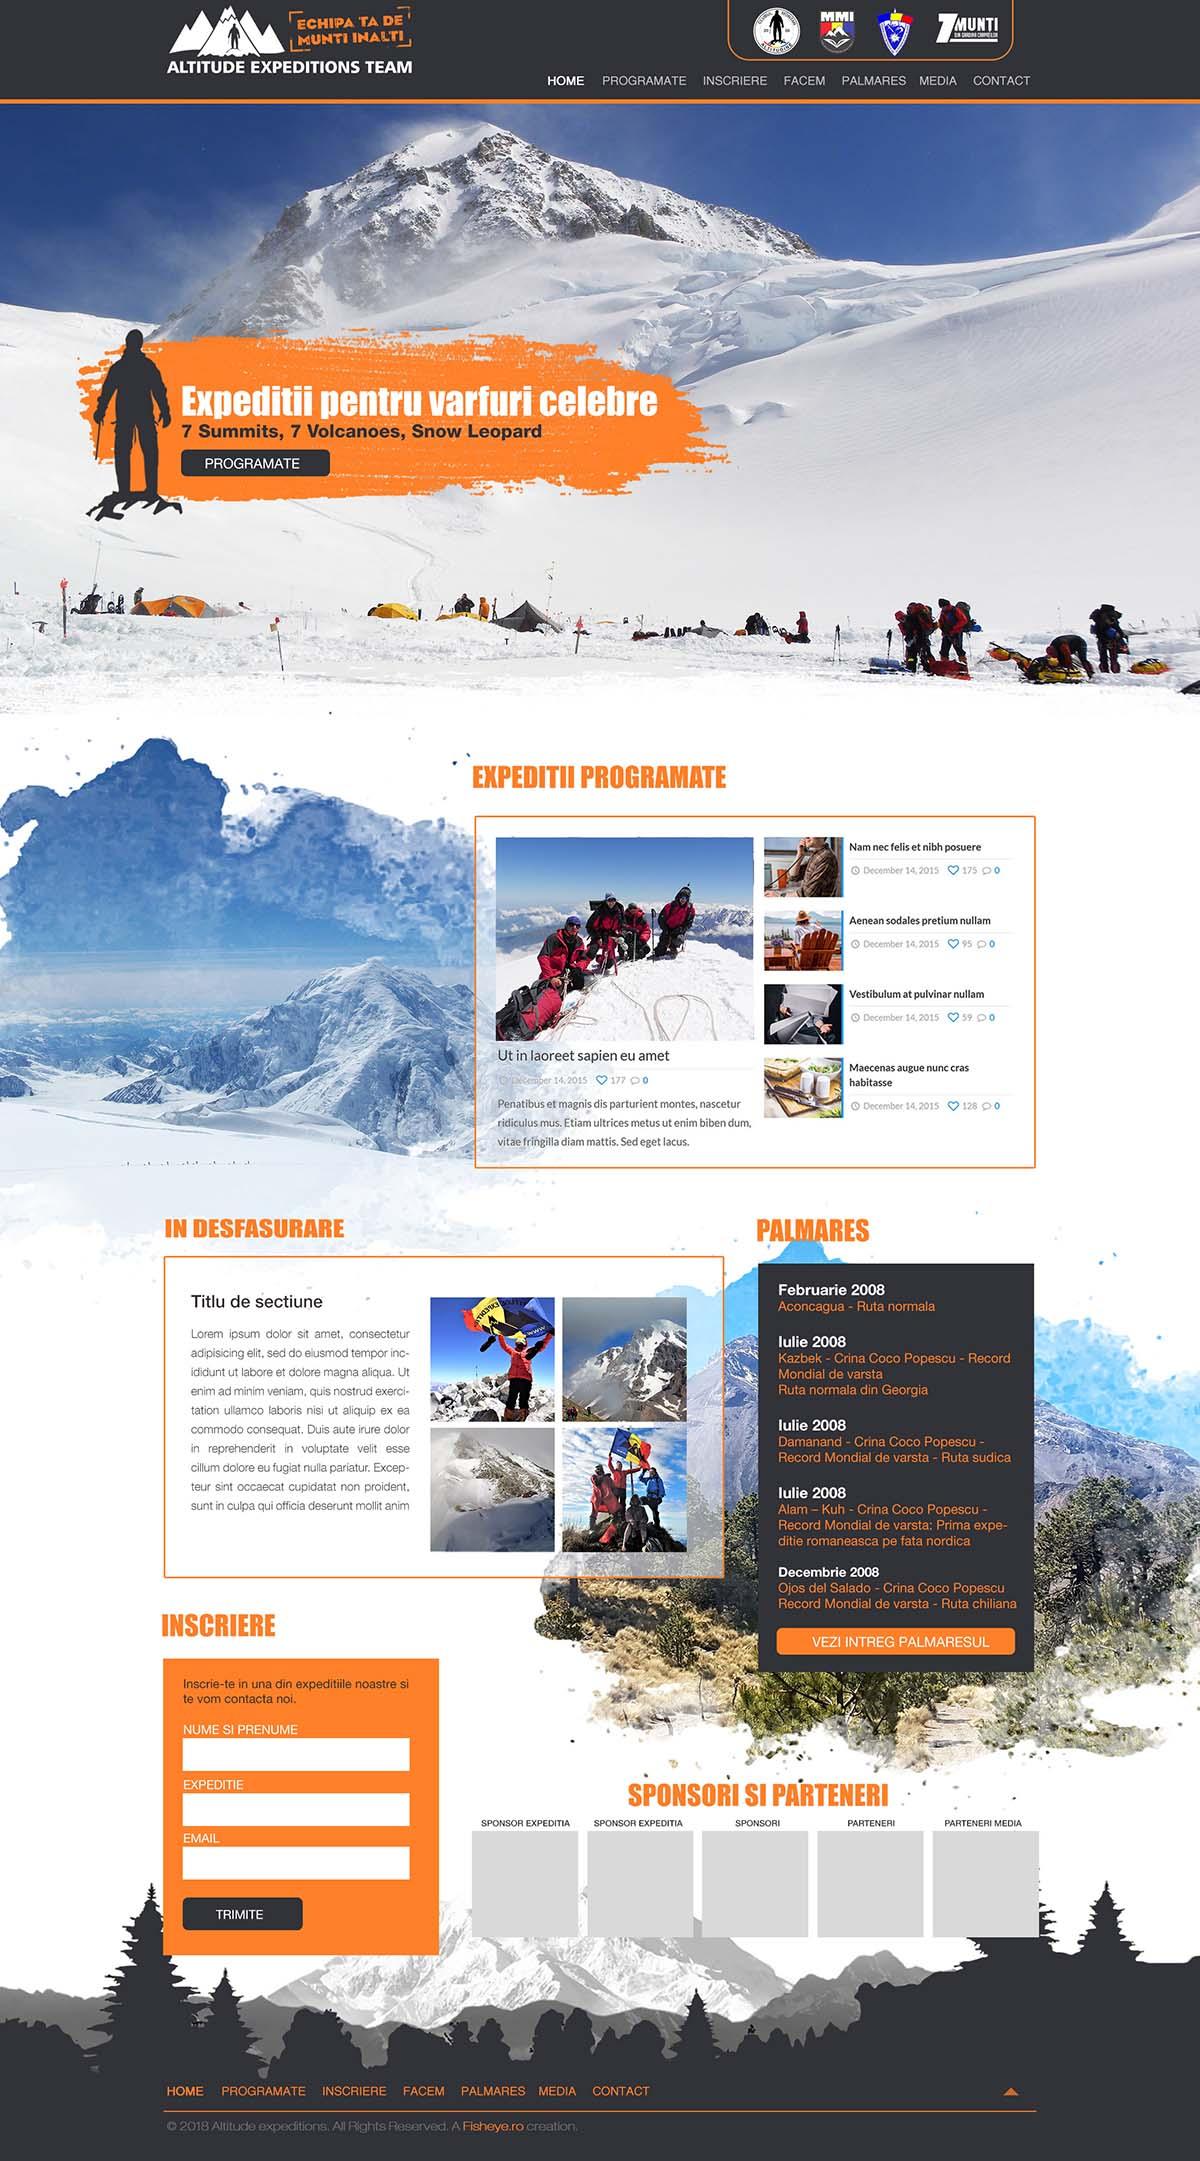 Webdesign Altitude Expeditions Team